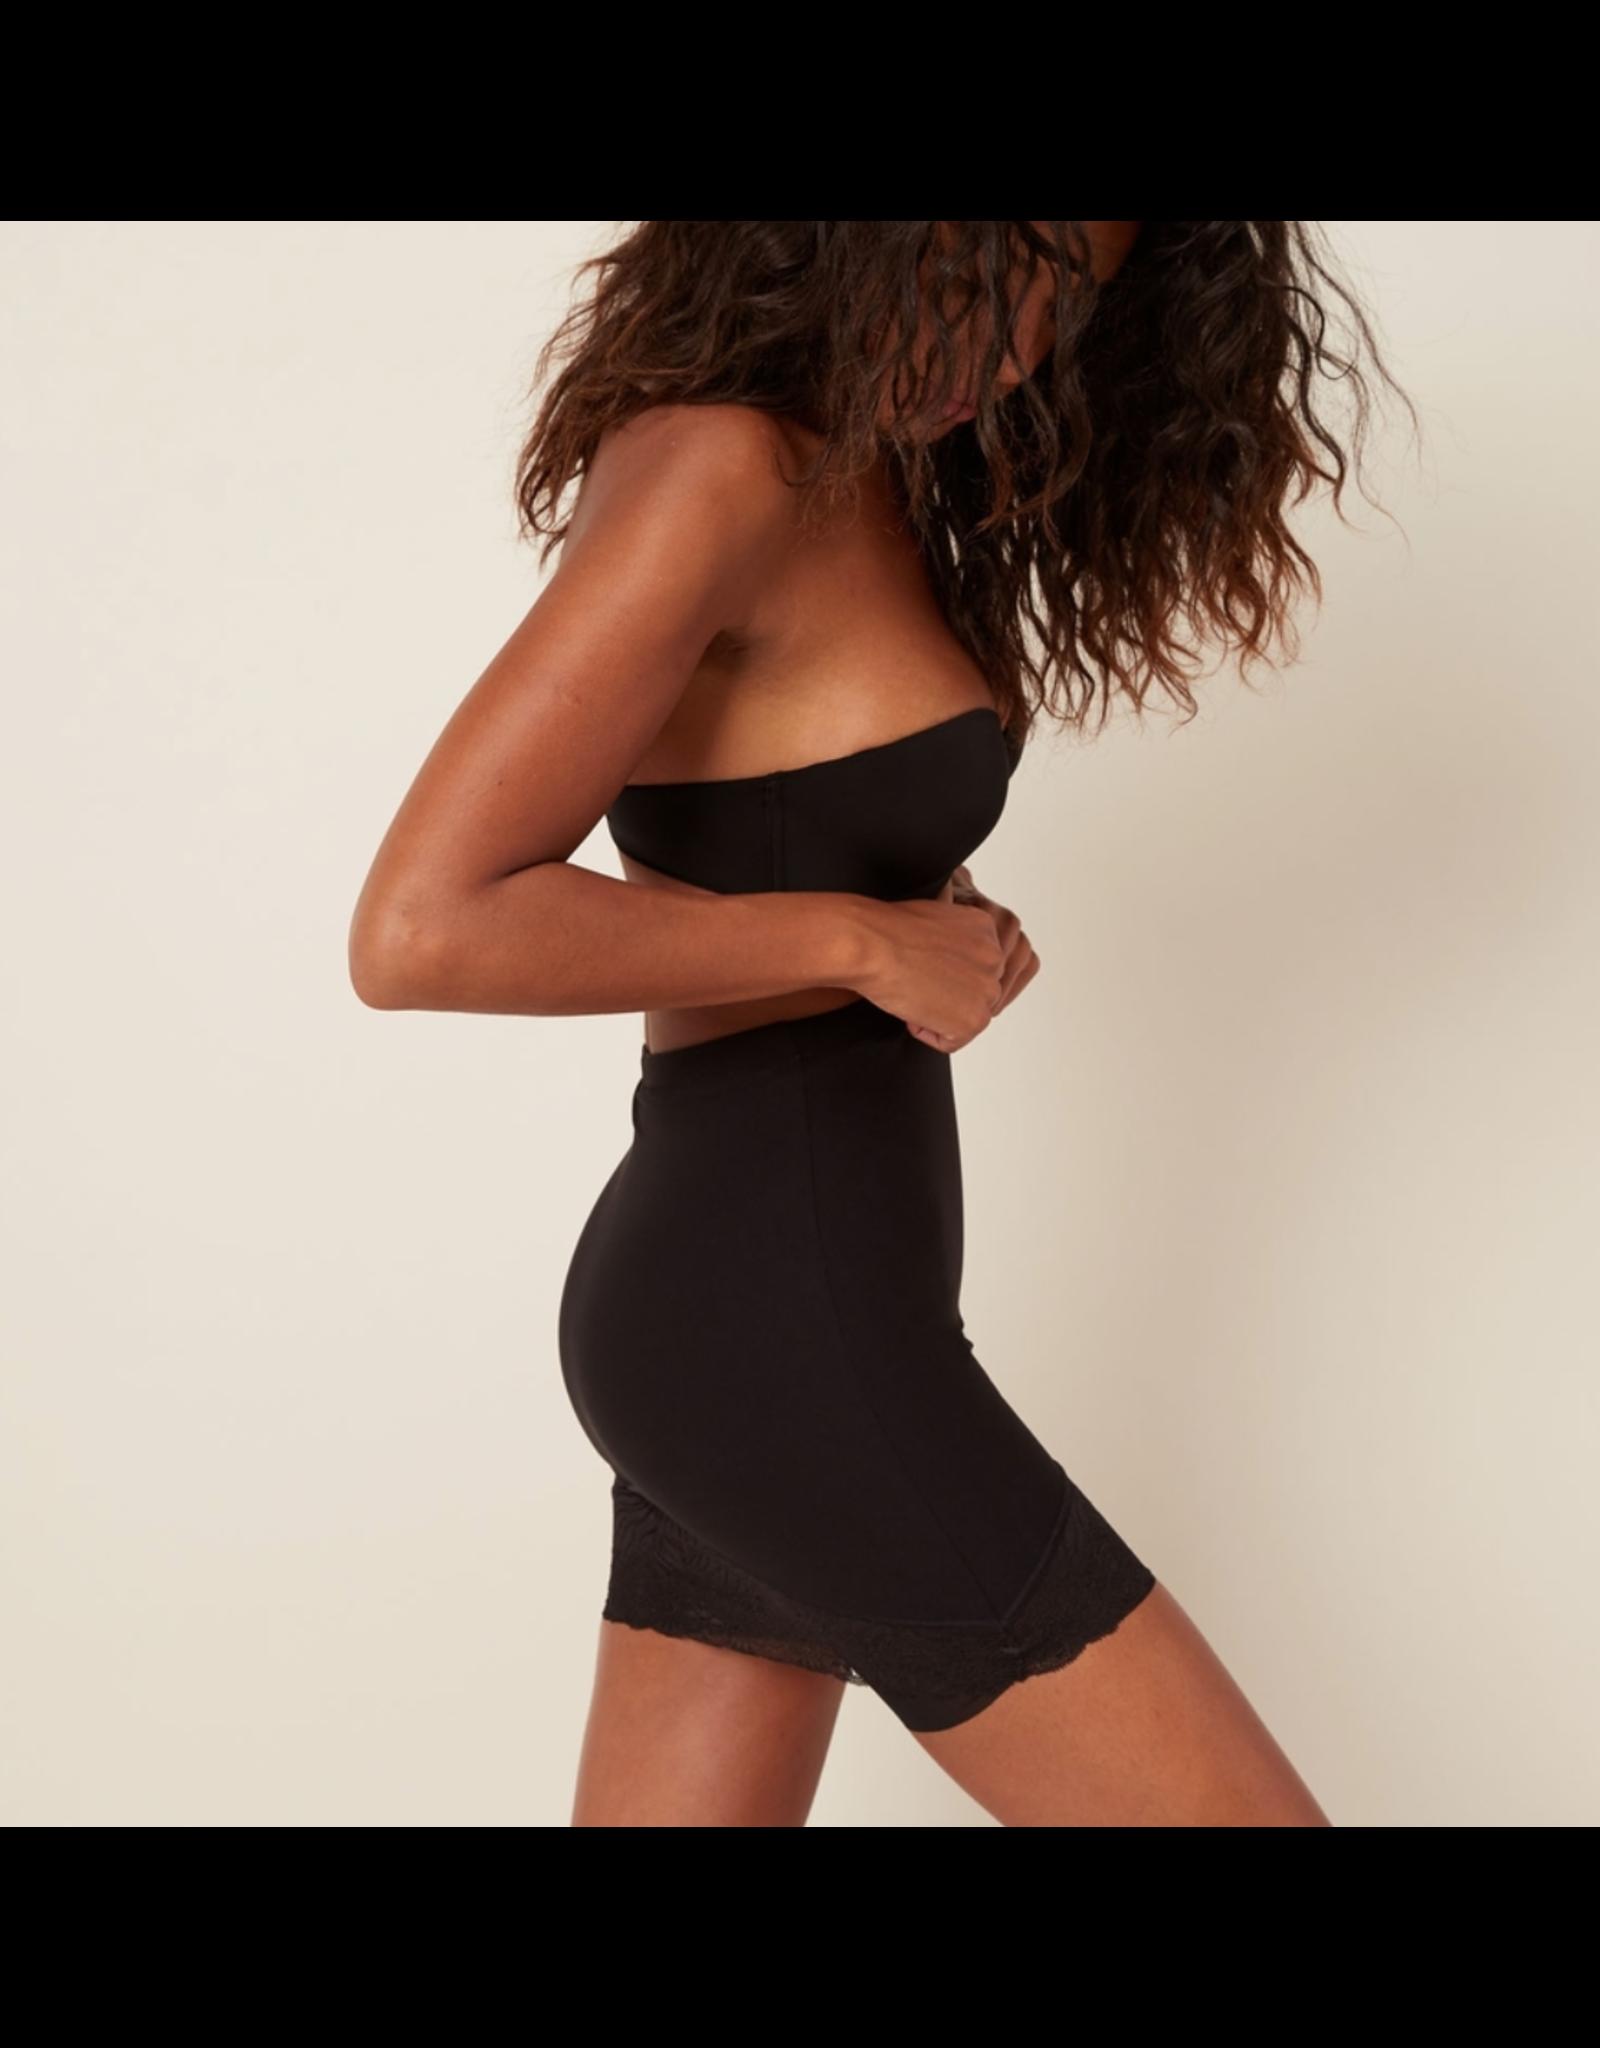 Simone Perele Simone Perele Top Model Half Slip